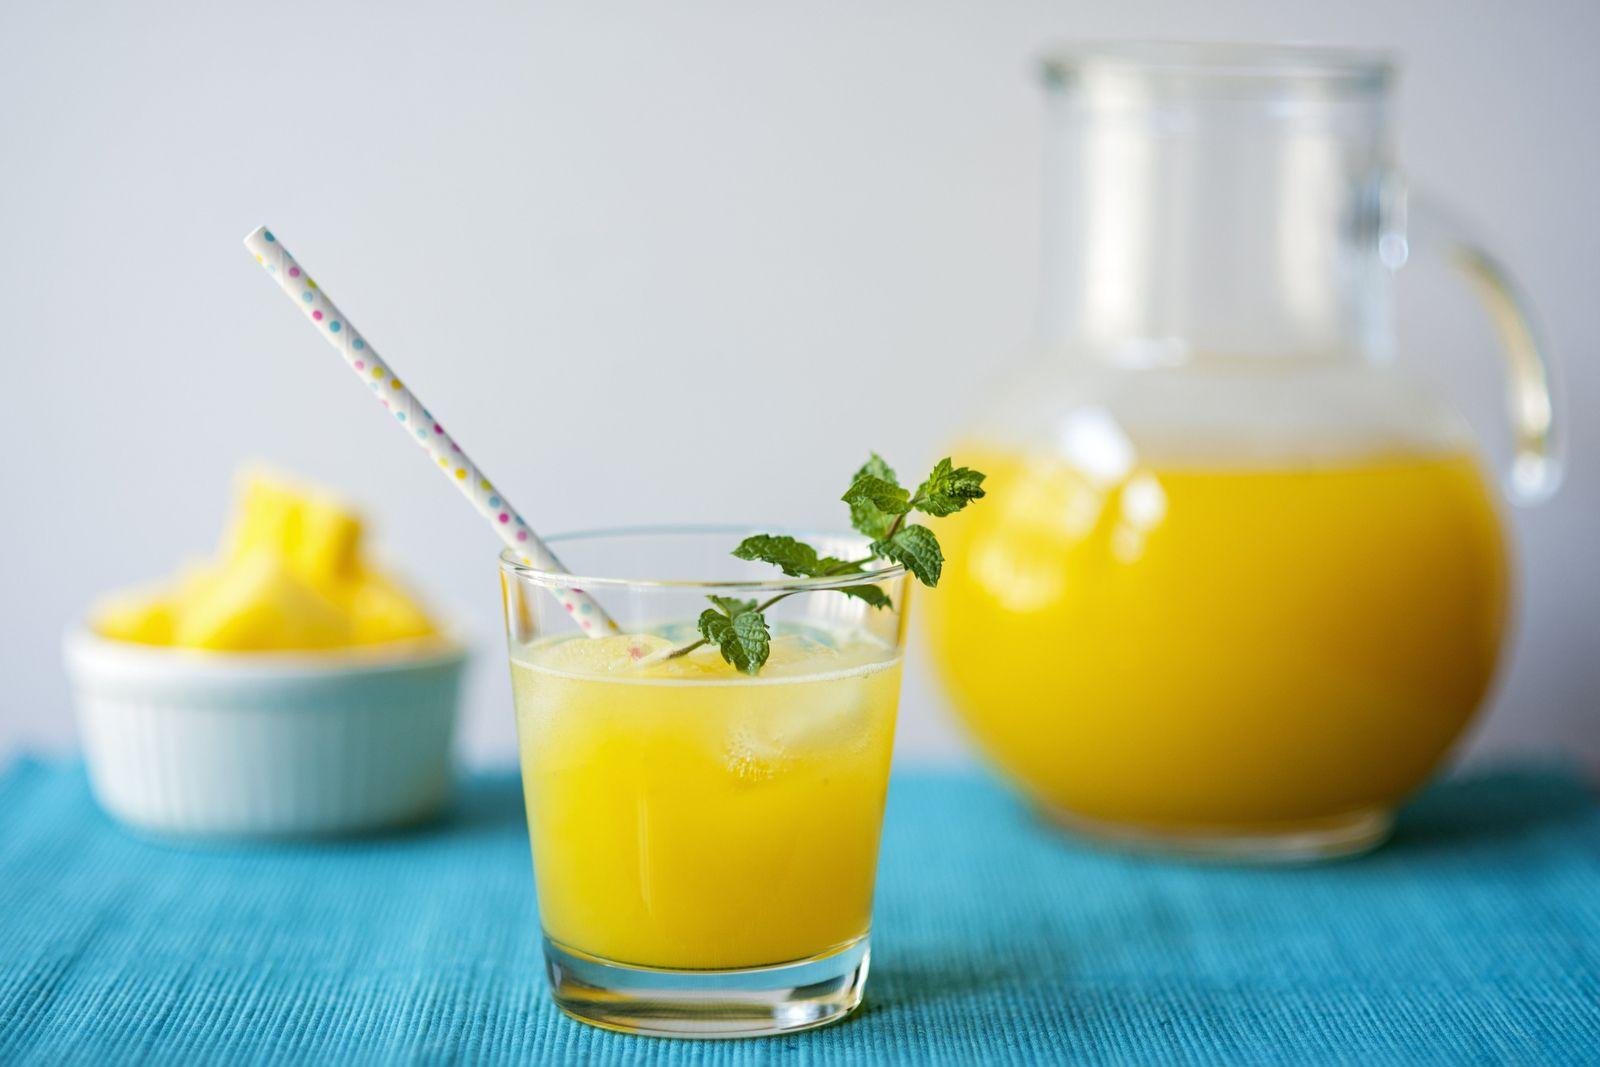 adgfoodwatermelon2019082100.JPG